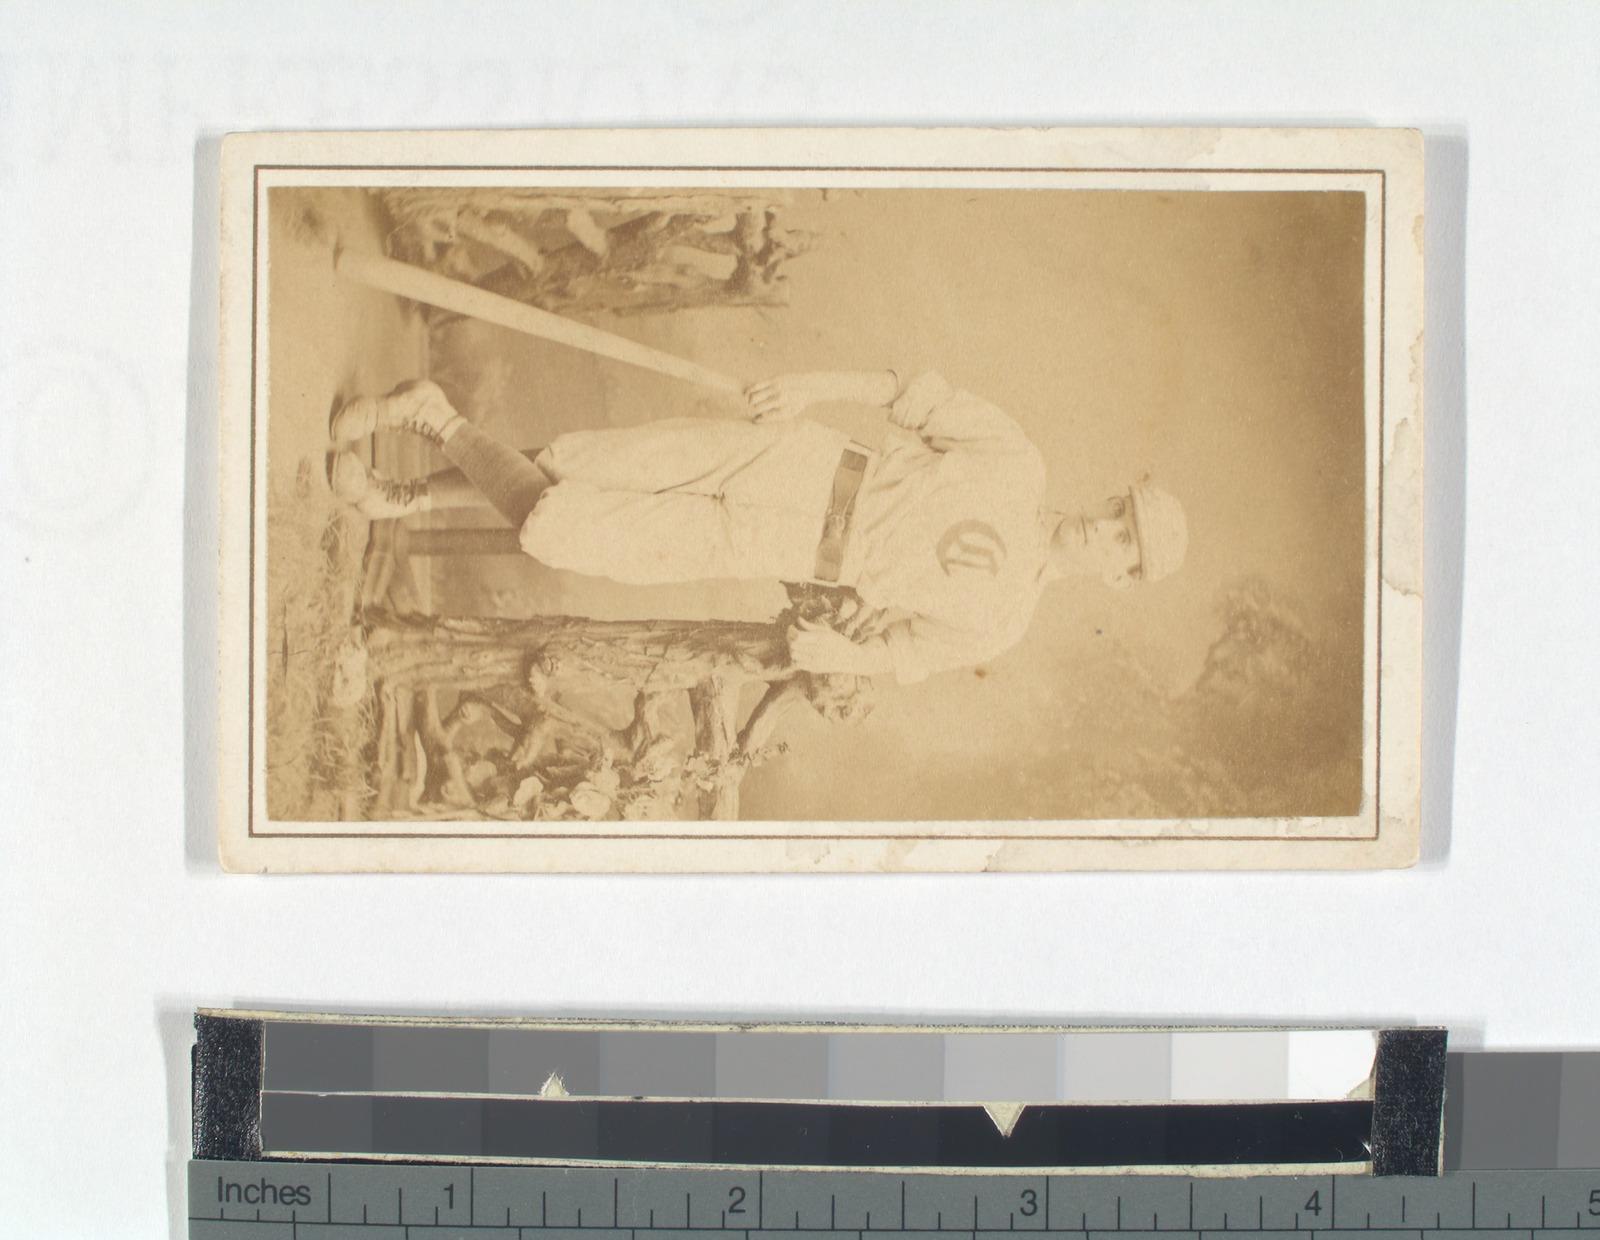 Unidentified baseball player, C.